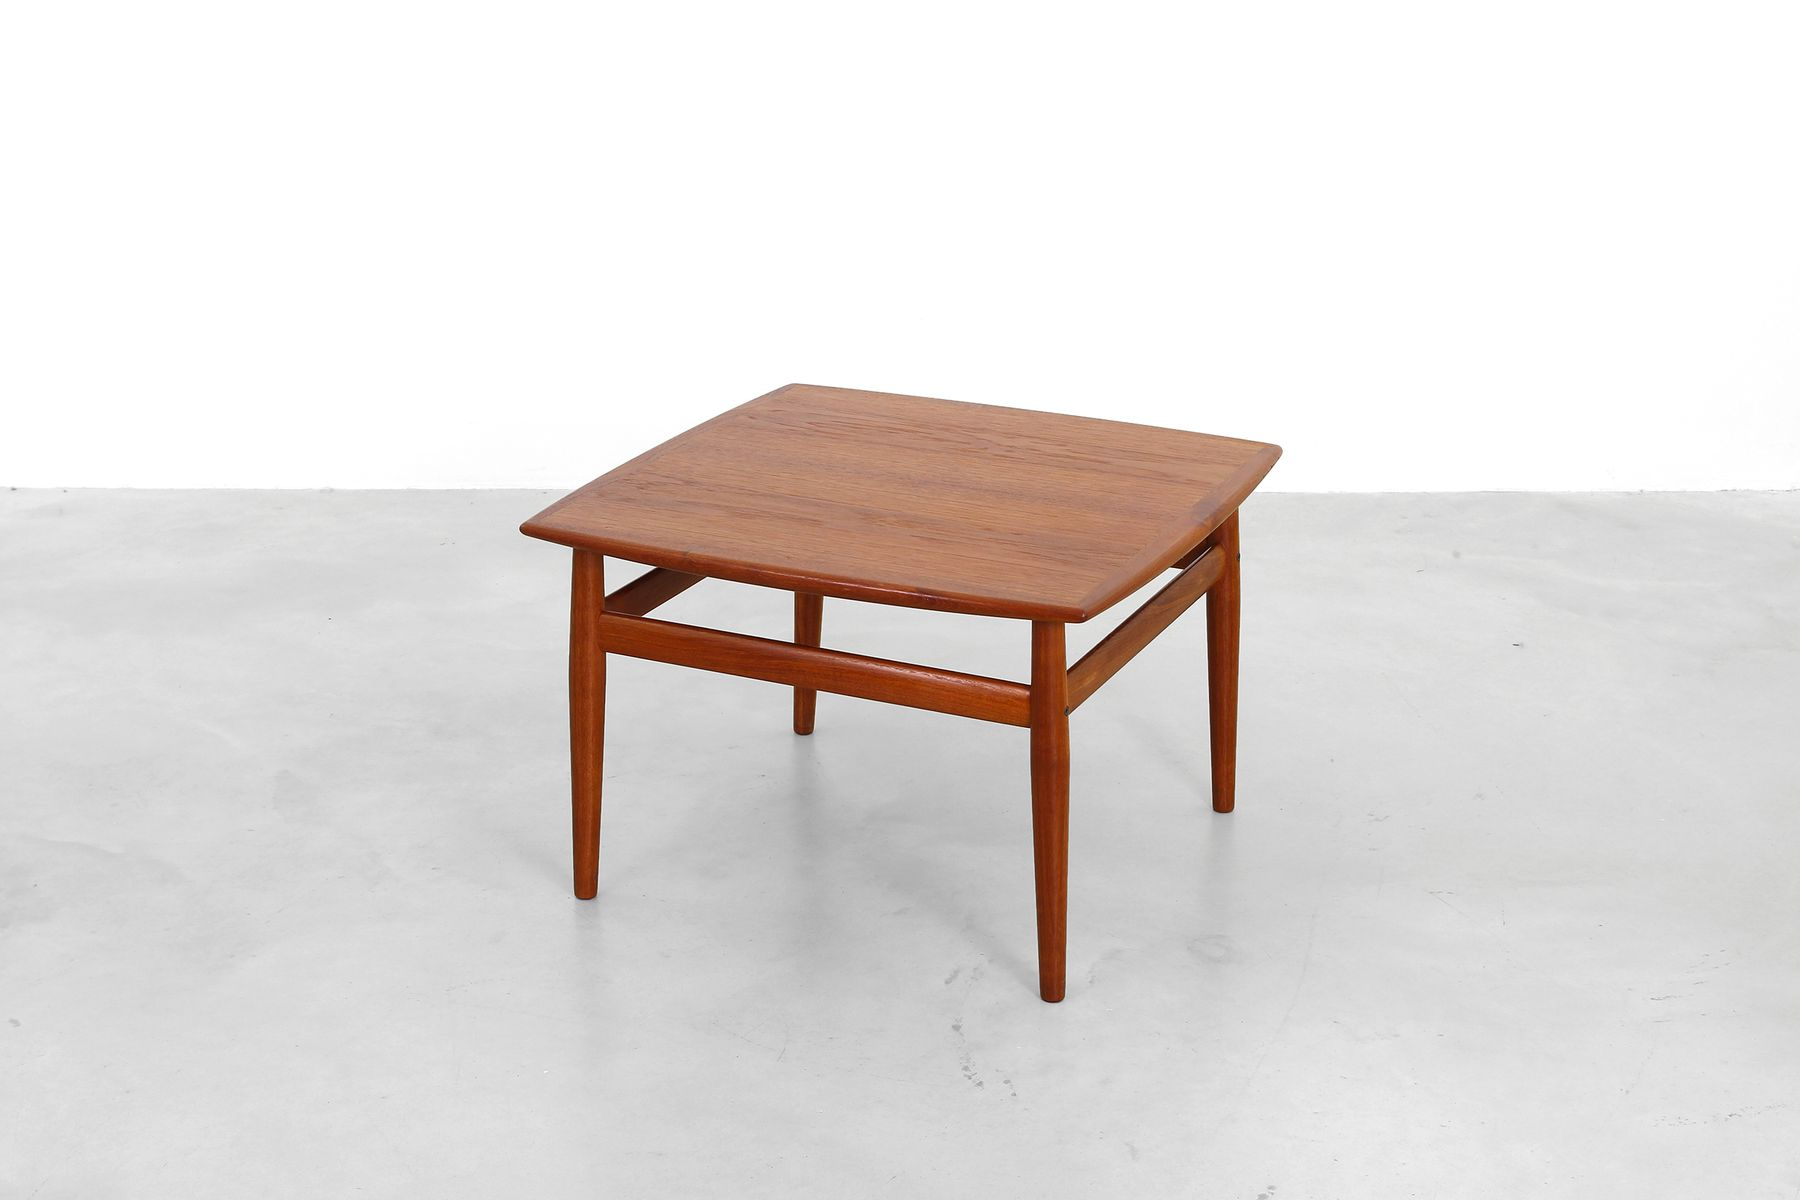 danish coffee table by grete jalk for glostrup ma belfabrik 1950s